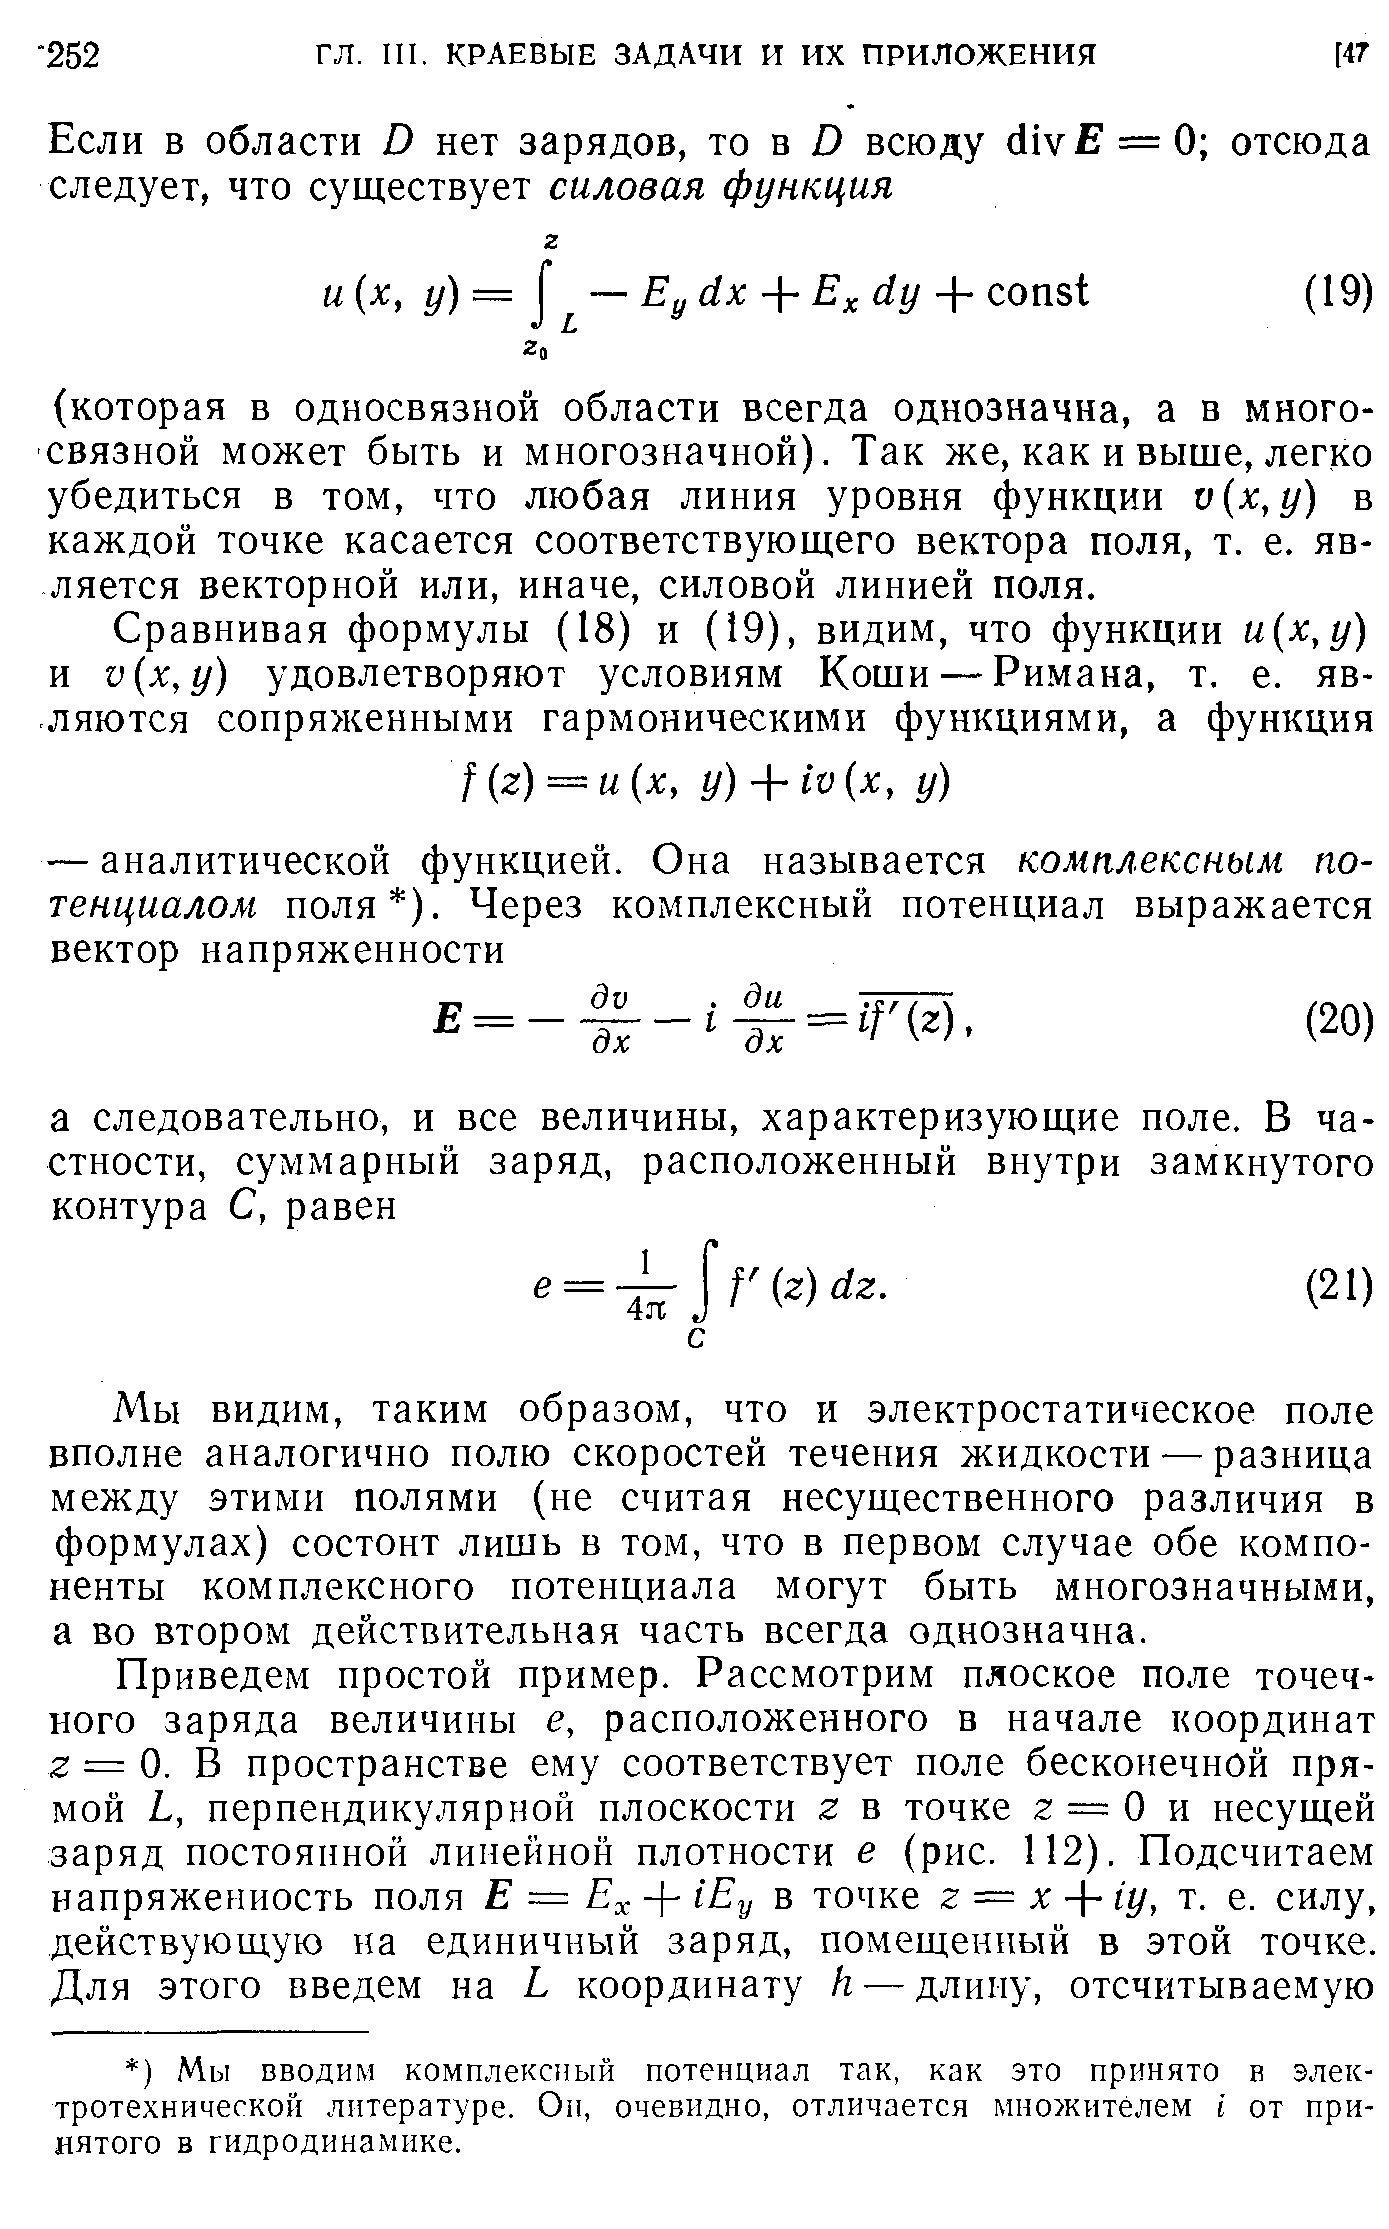 https://i5.imageban.ru/out/2019/11/14/fc8ec251c64820de6fb3f71e687748f7.jpg